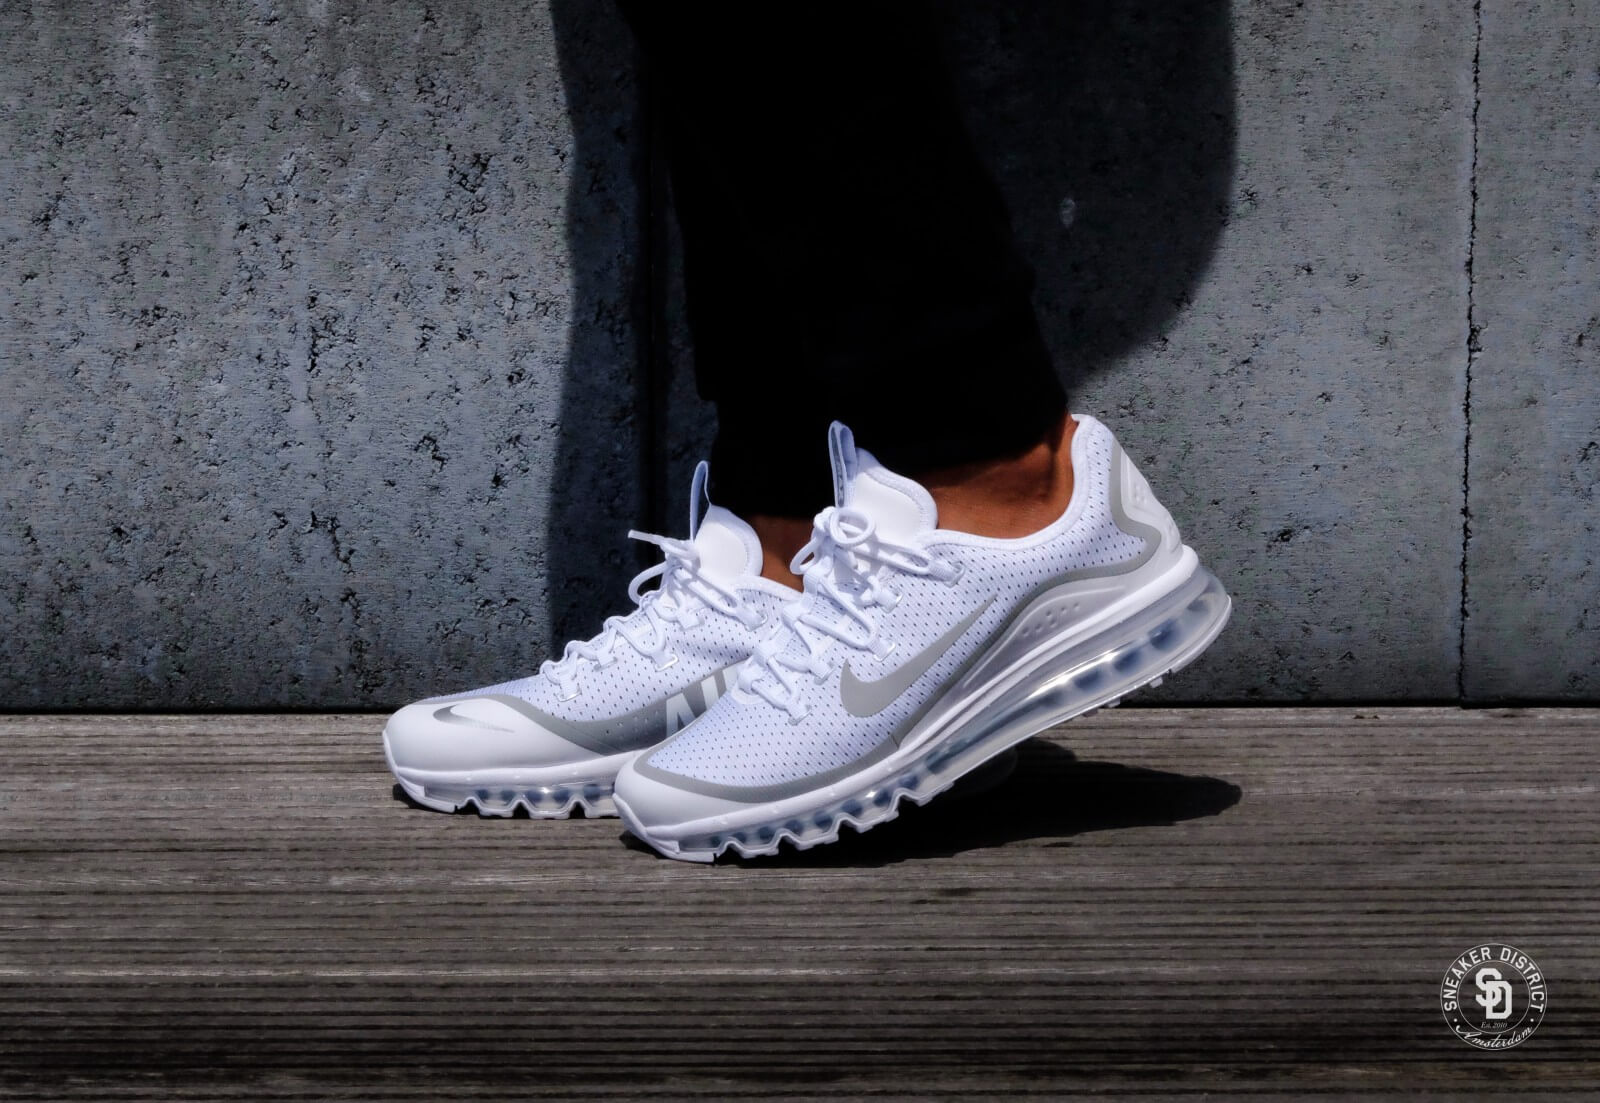 Nike Air Max More White/Metallic Silver-Black - 898013-100